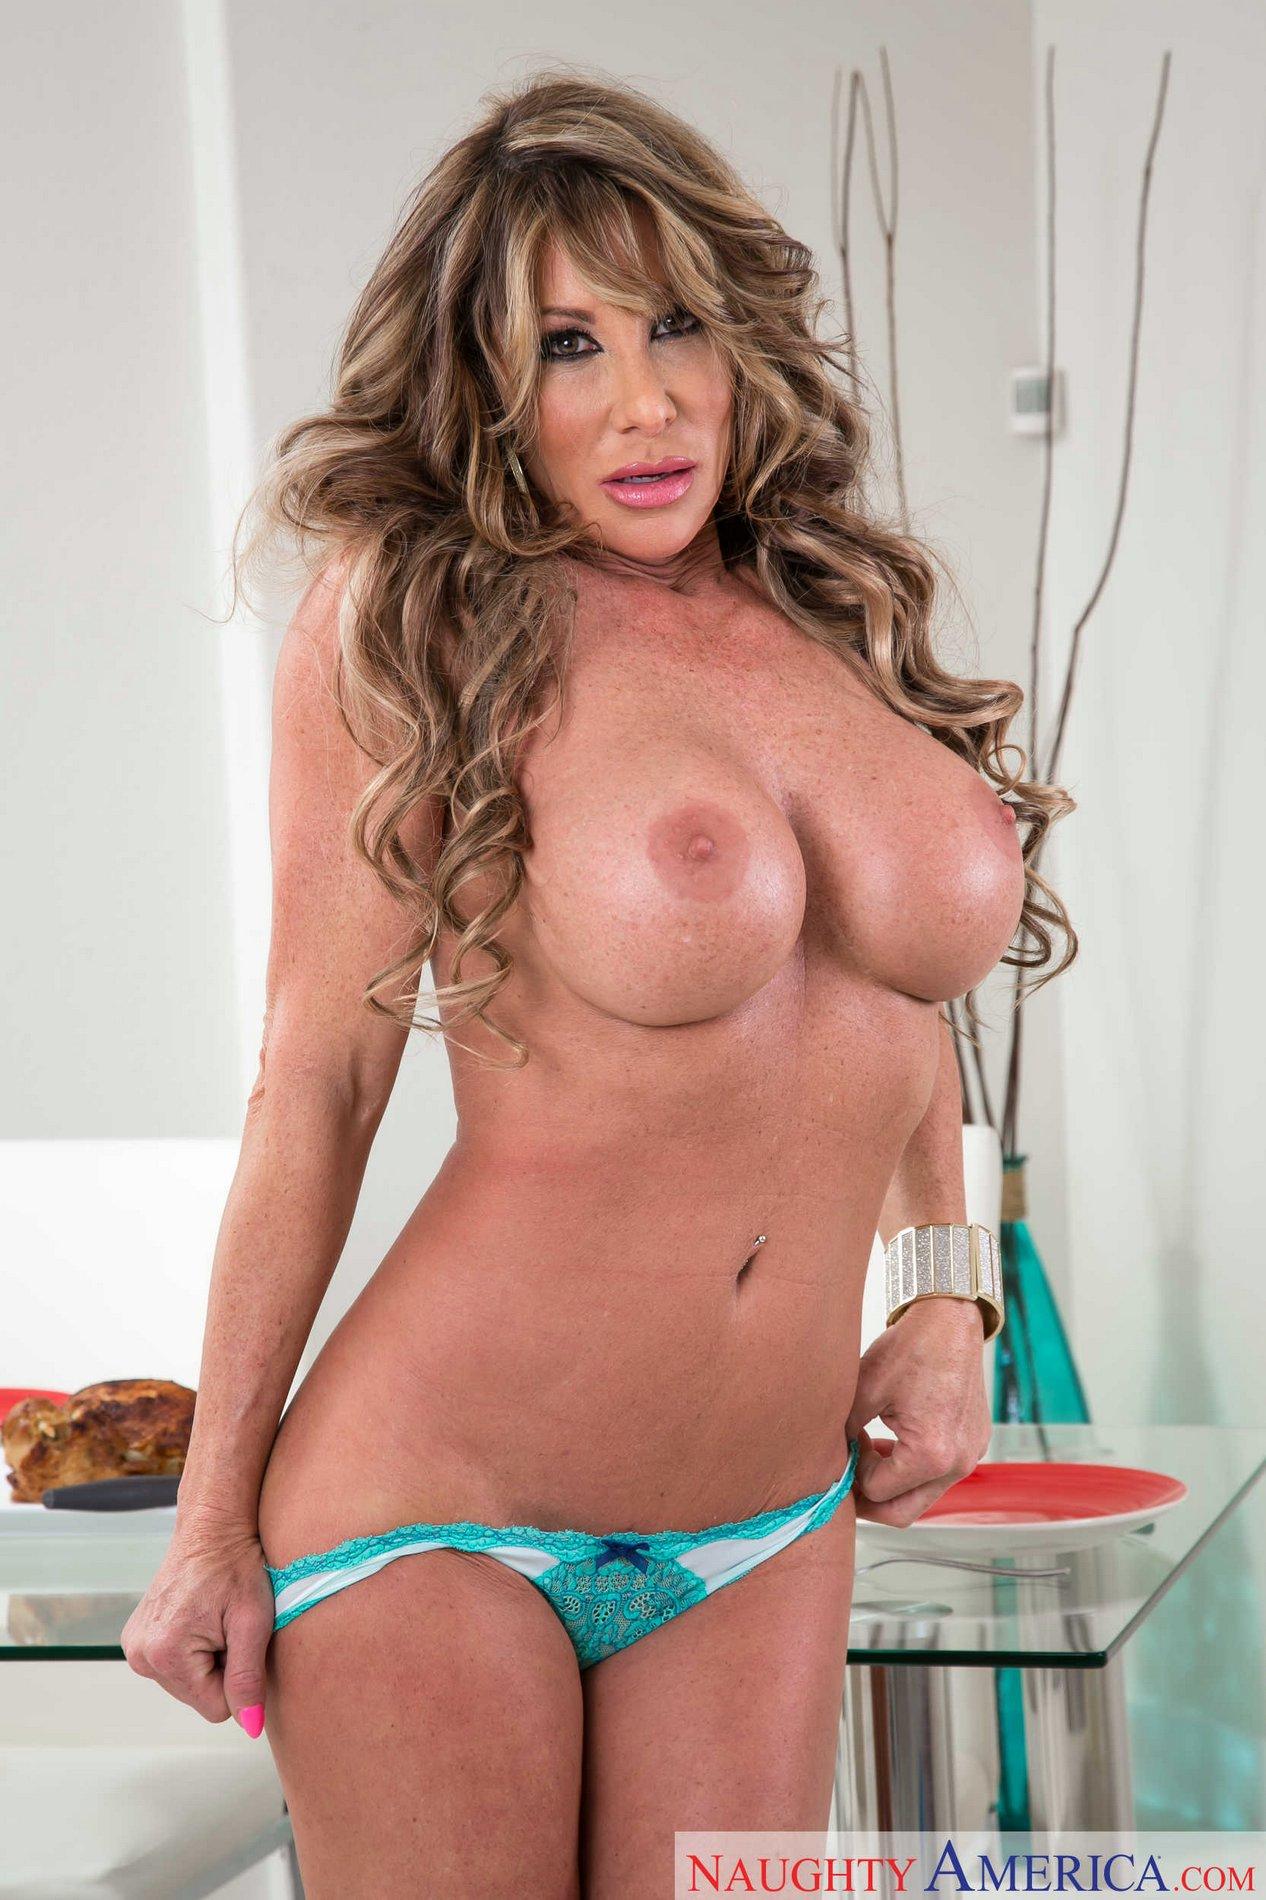 Farrah pornstar